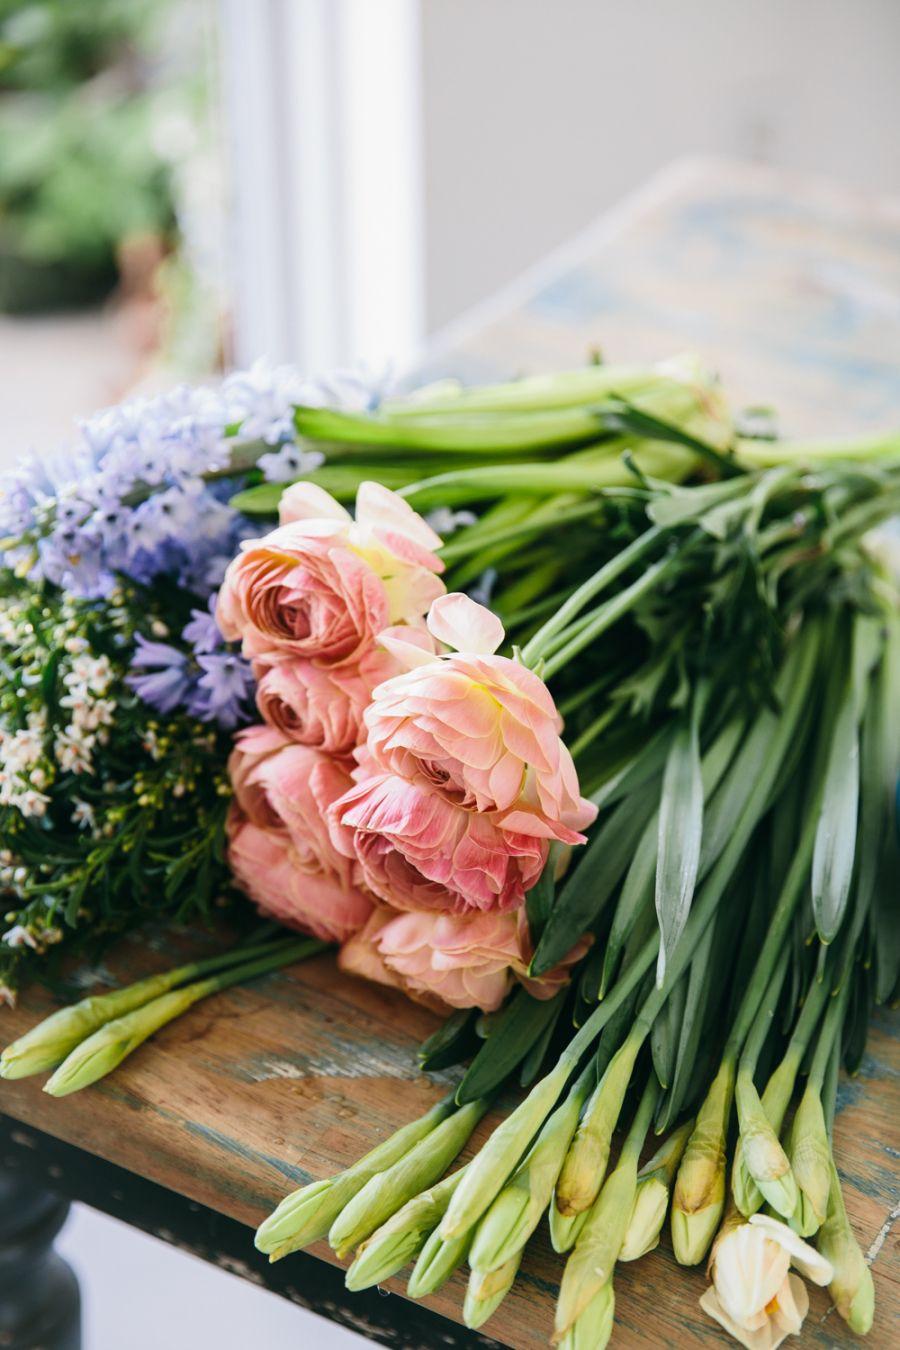 Pin by adytravel ireta on paisajes y flores pinterest flower